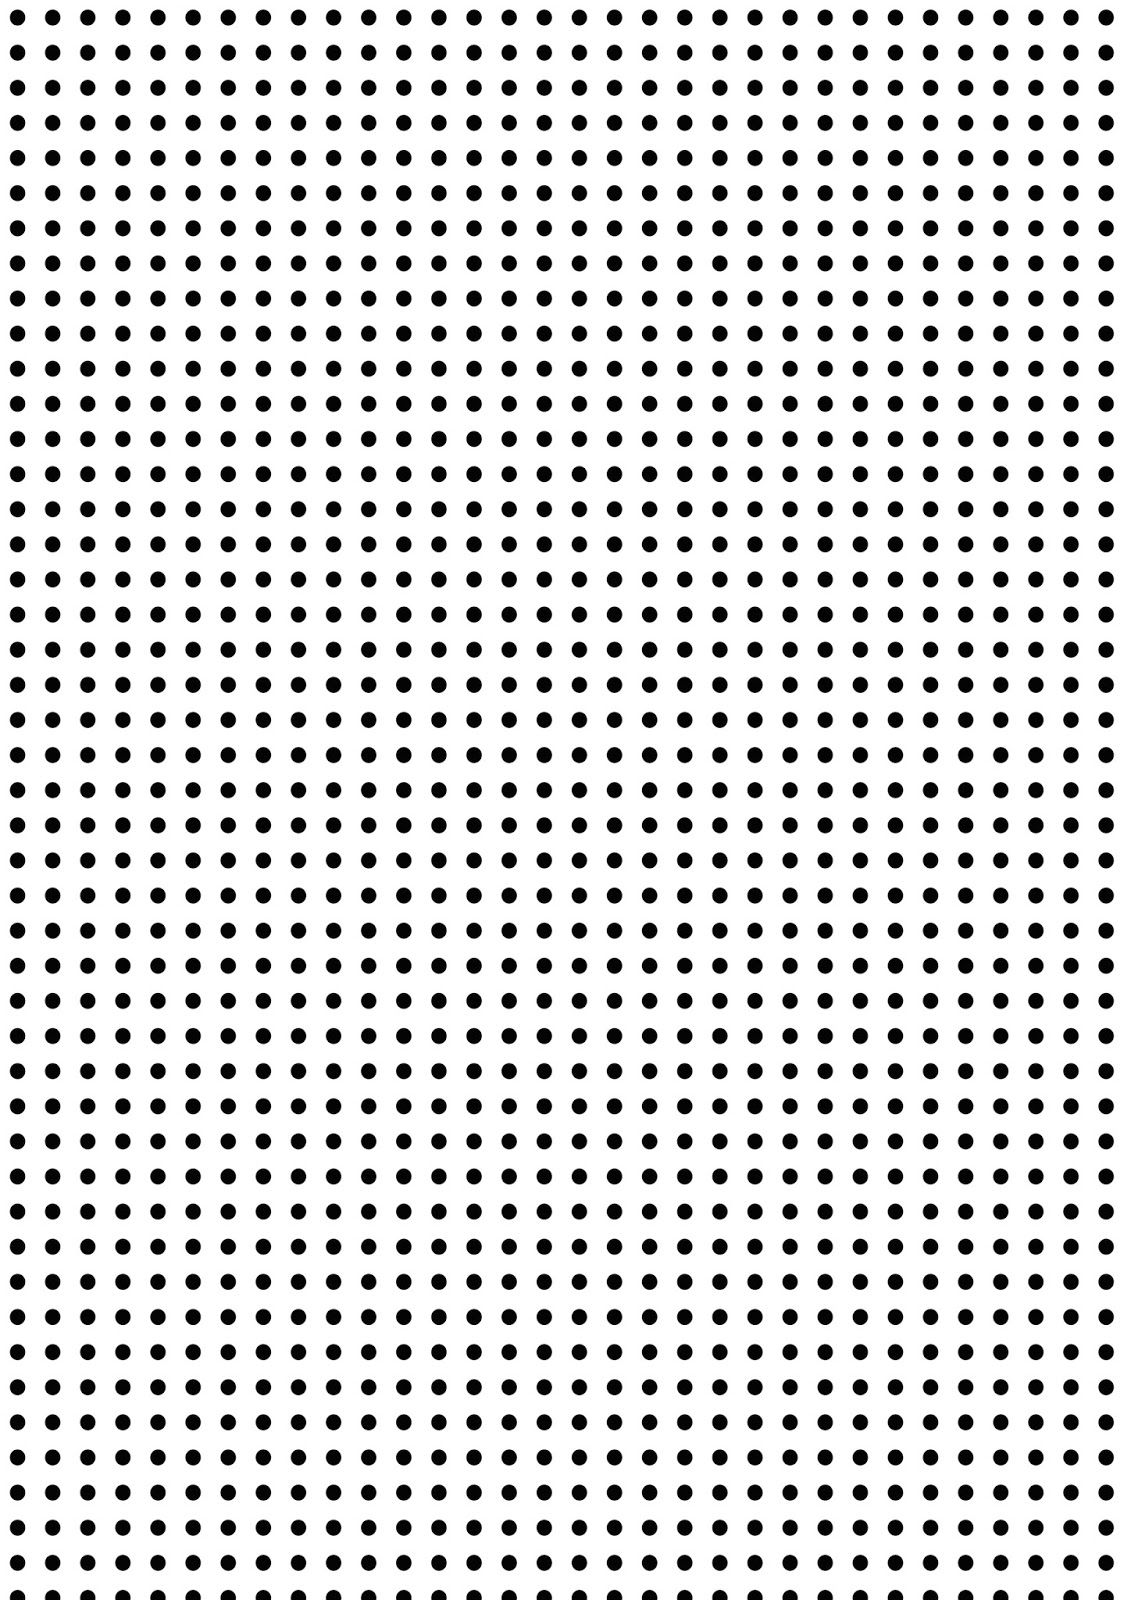 Free Printable BlackAndWhite Dots Pattern Paper  Kolorowe